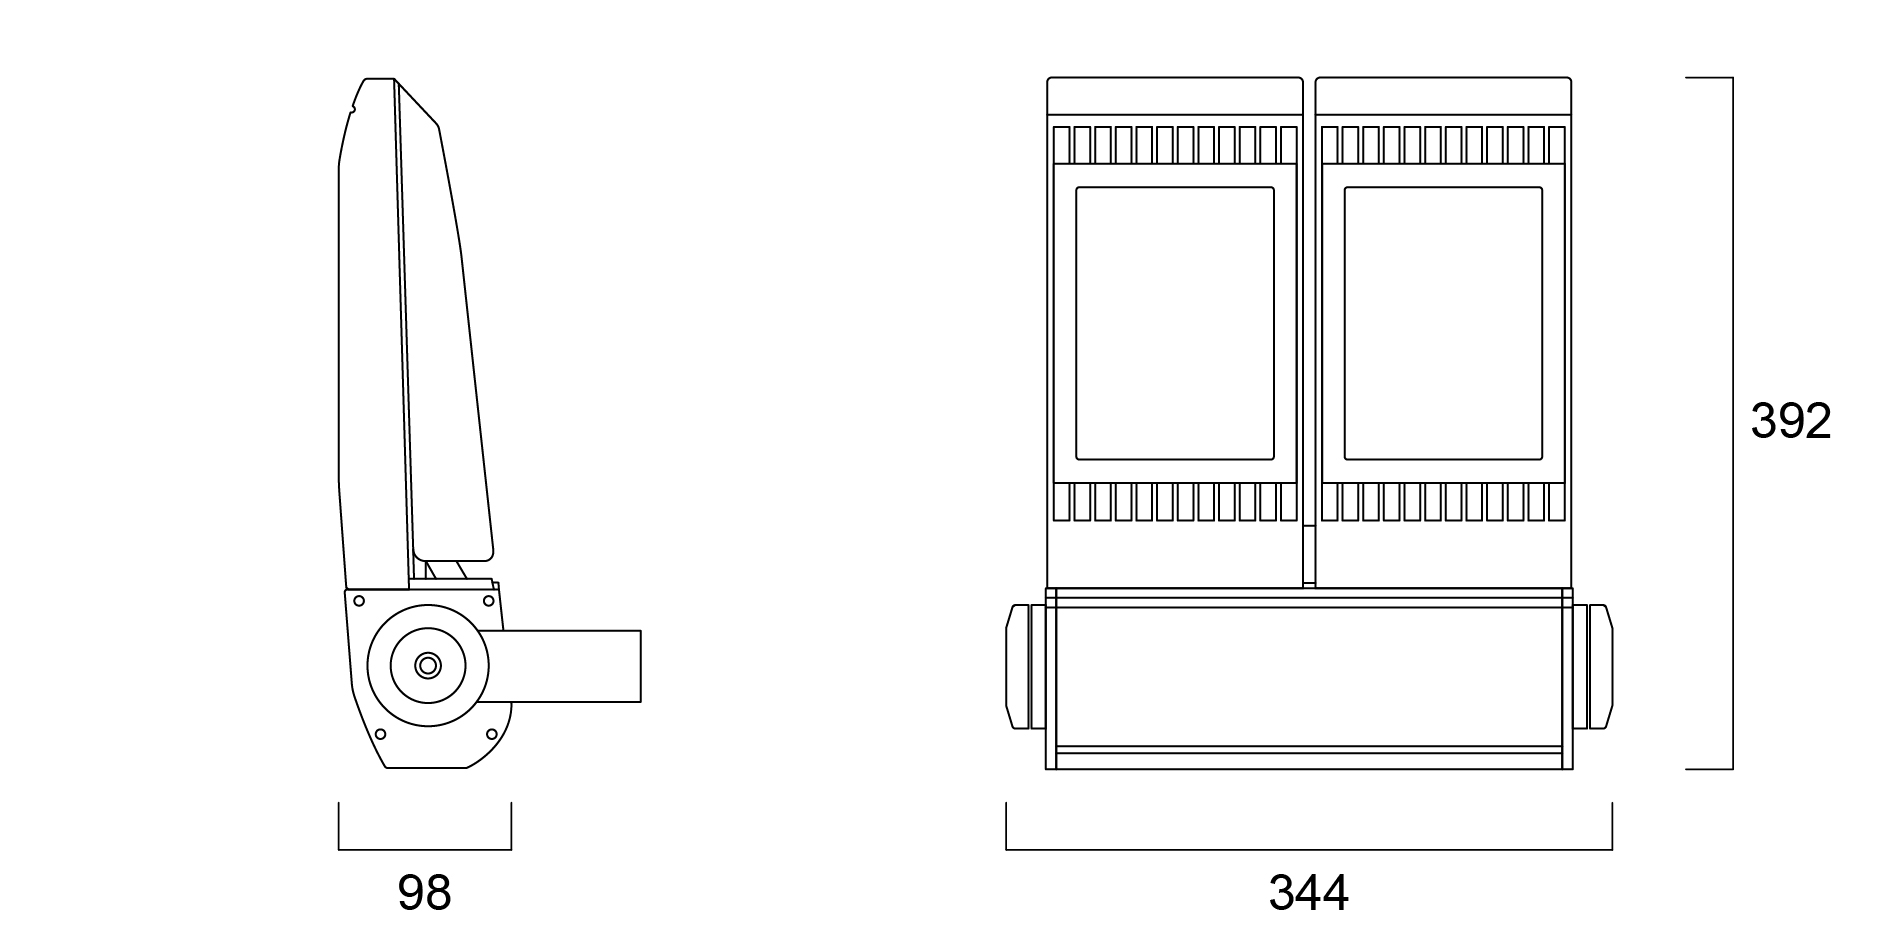 http://v2.static.sylvania-lighting.online/Hybris_V2/0049112/Technical_Drawings/EN/sylveo_12000lm_line_drawing.jpg